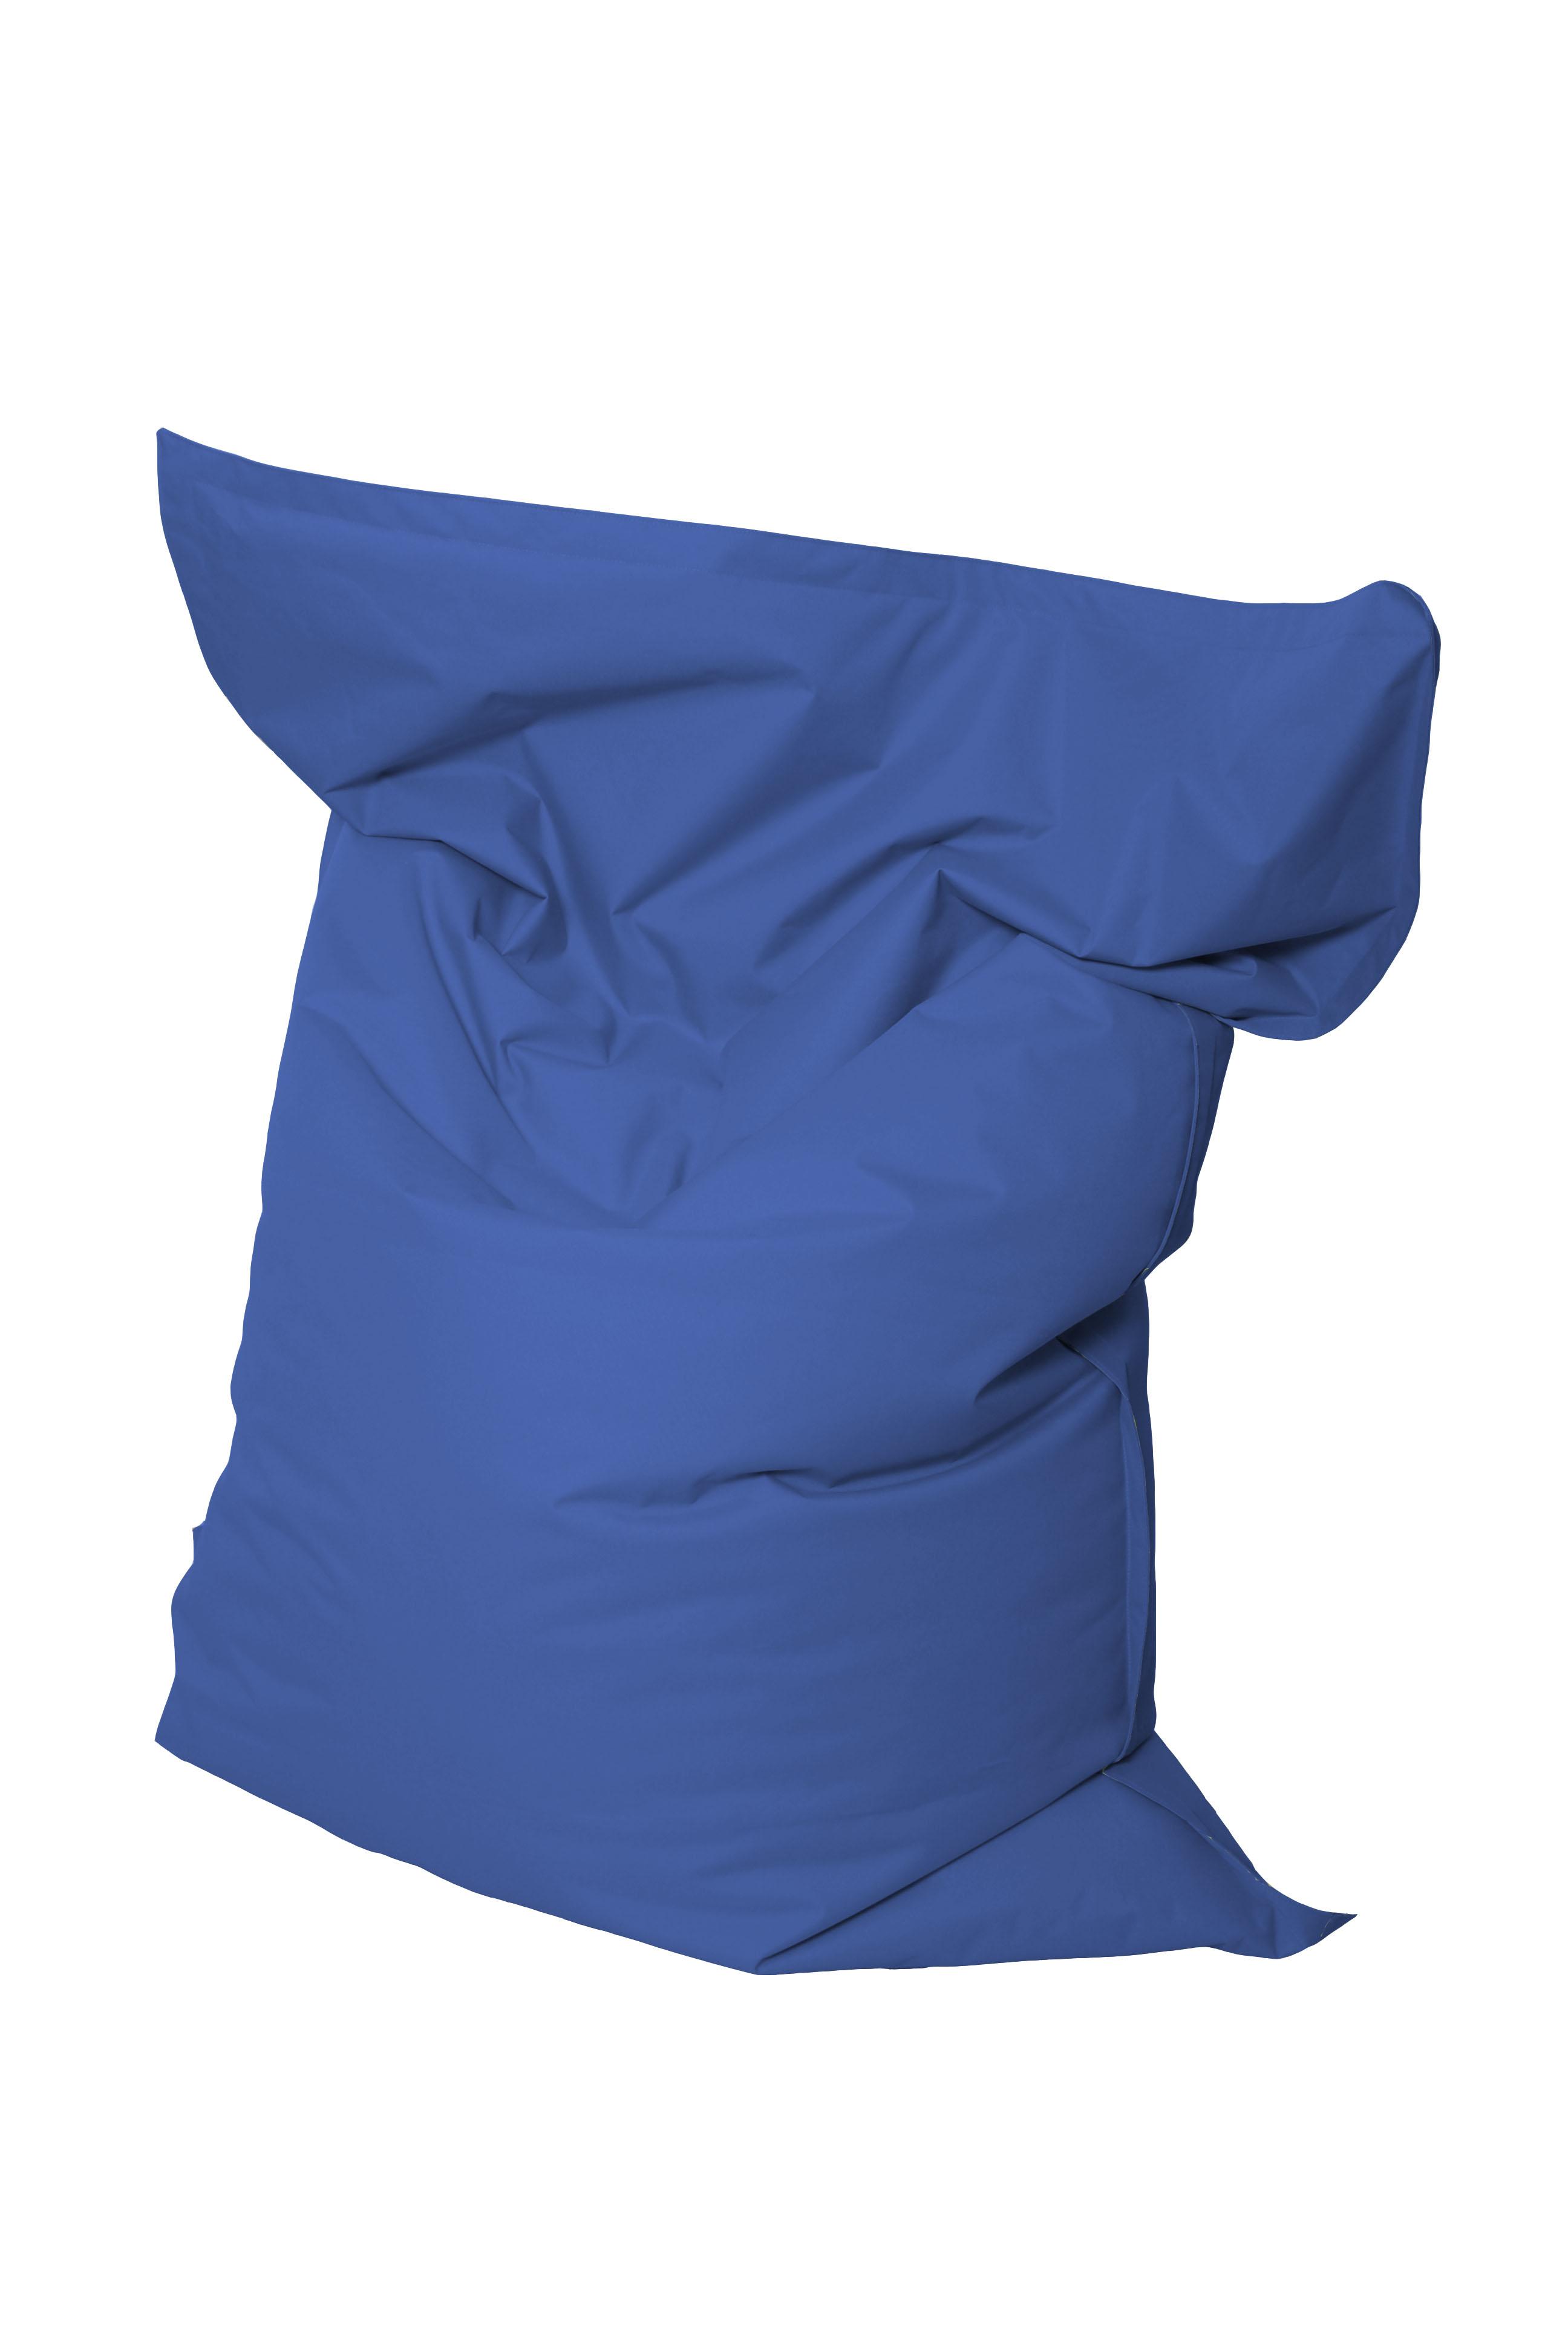 M&M sedací vak Maxi 200X140cm modrá (modrá 80175)